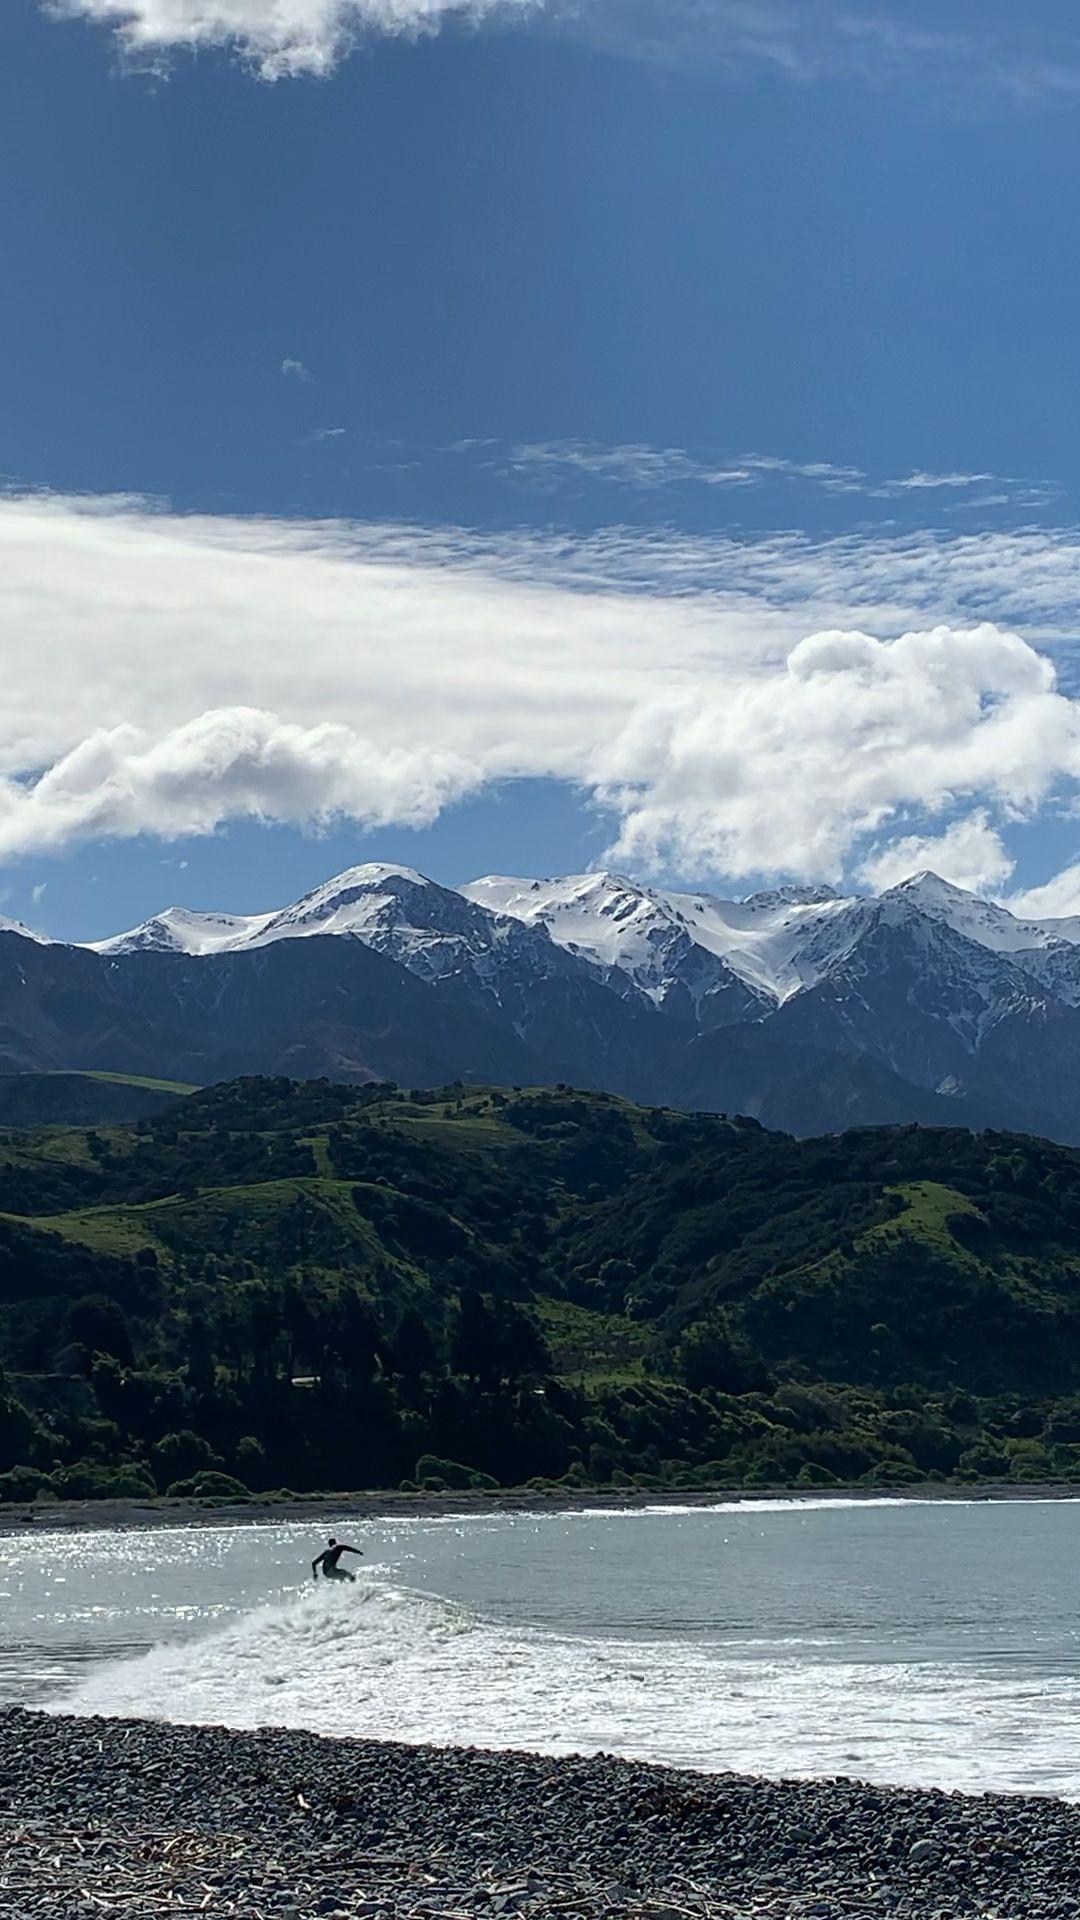 #newzealand #newzealandtravel #surf #ocean #surfing #travel #outdoors